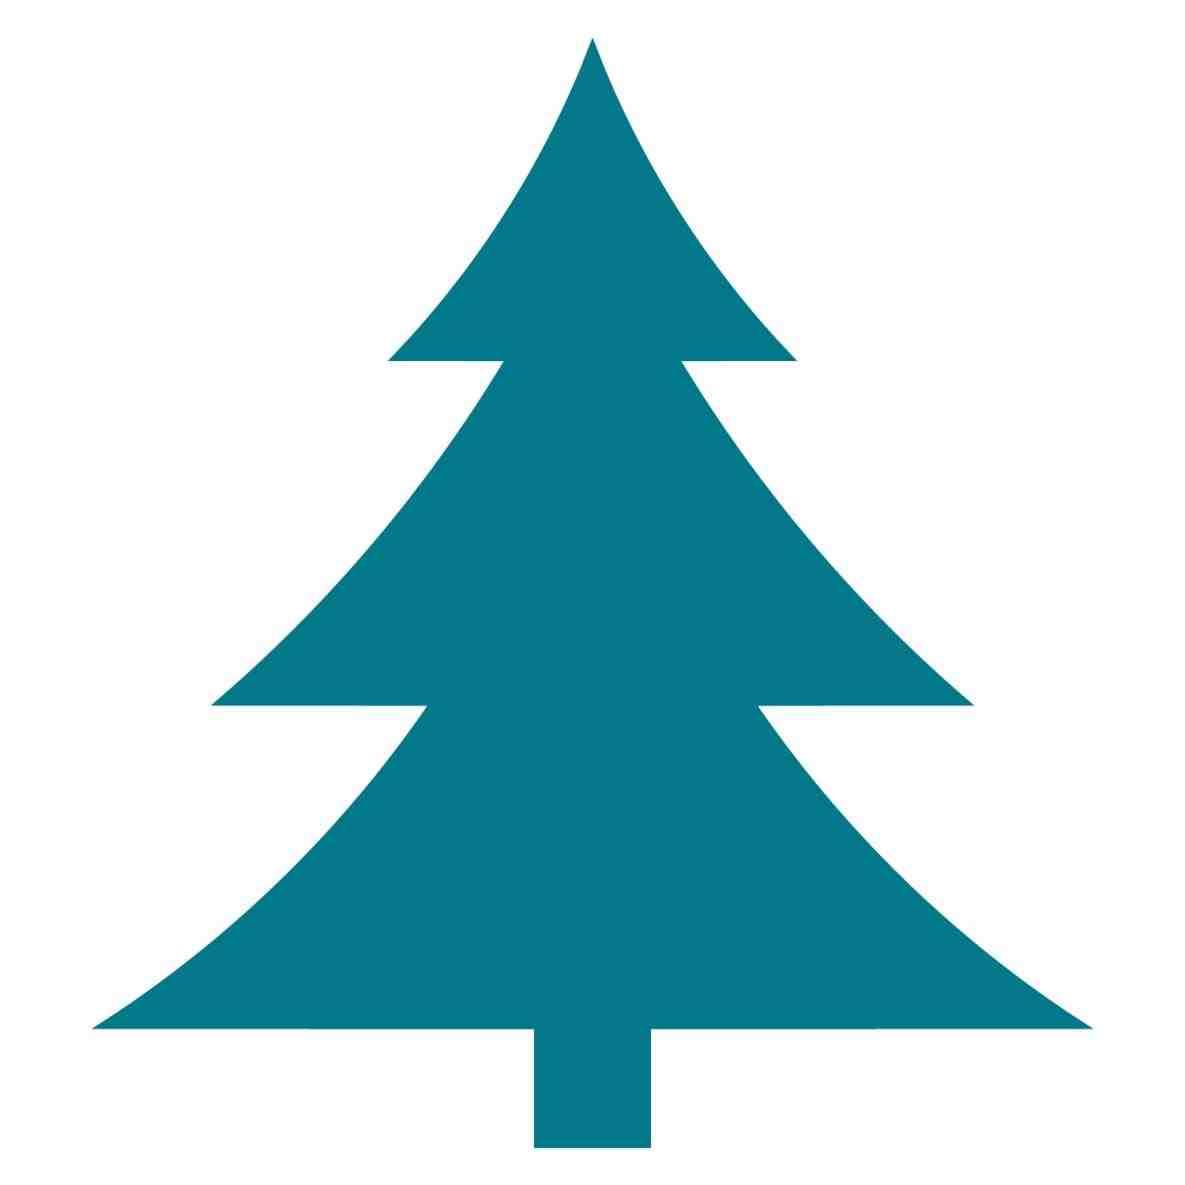 1185x1185 Simple Christmas Tree Silhouette Cheminee.website